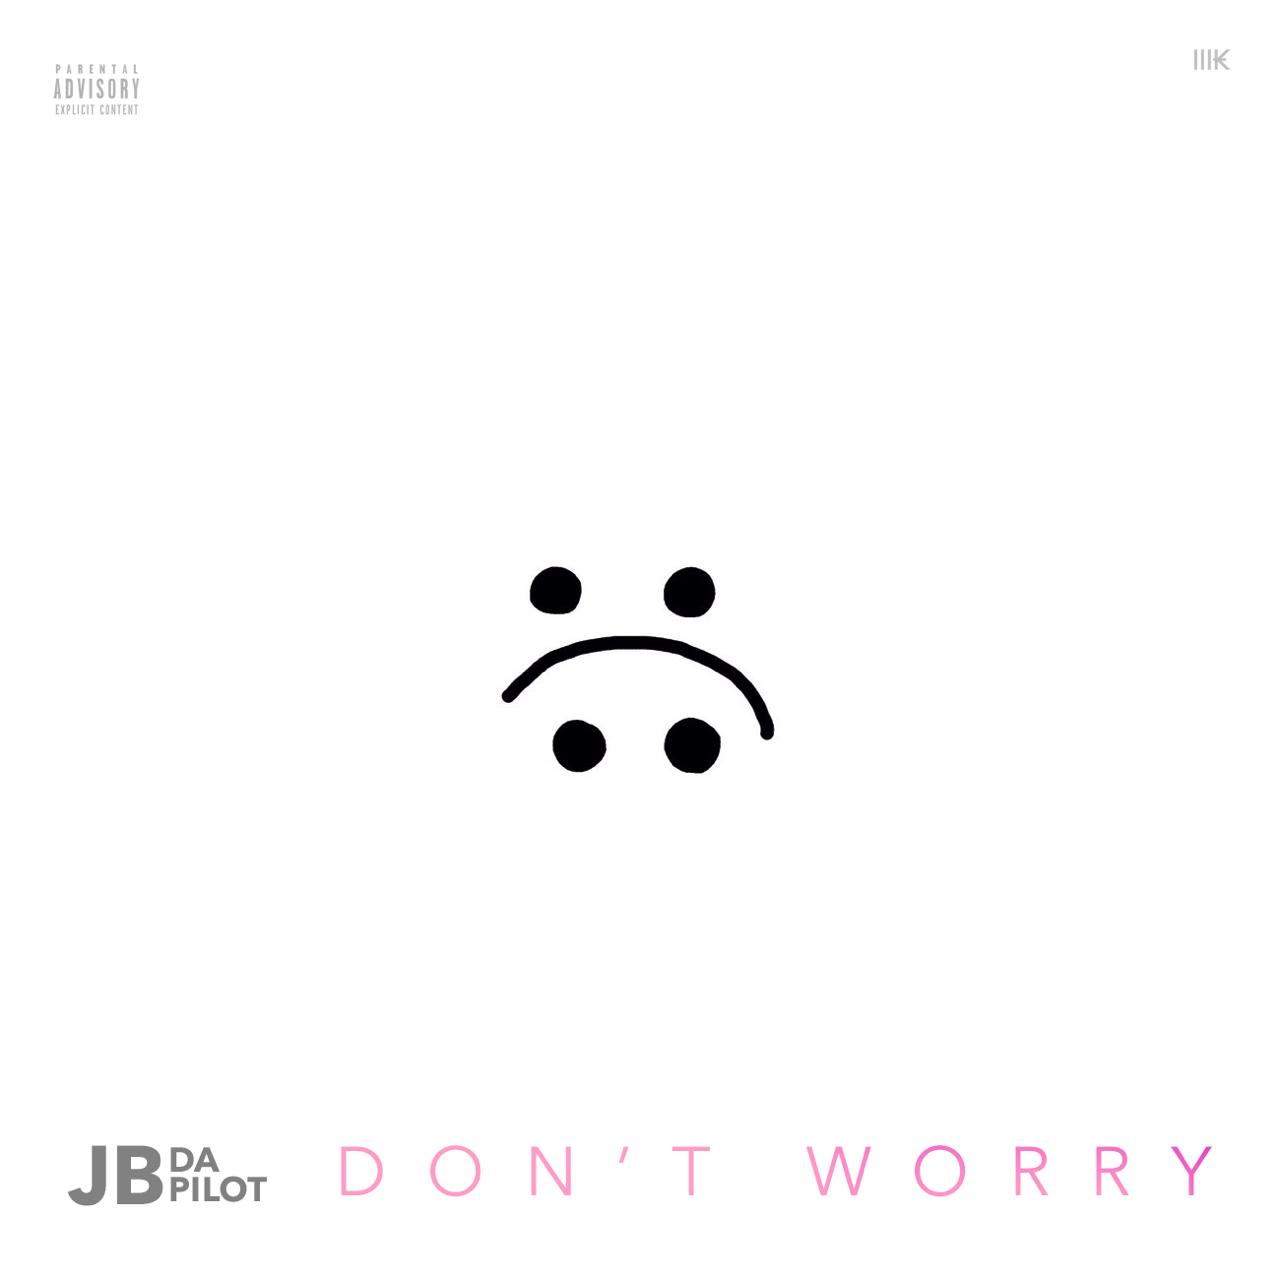 JB Da Pilot - Don't Worry